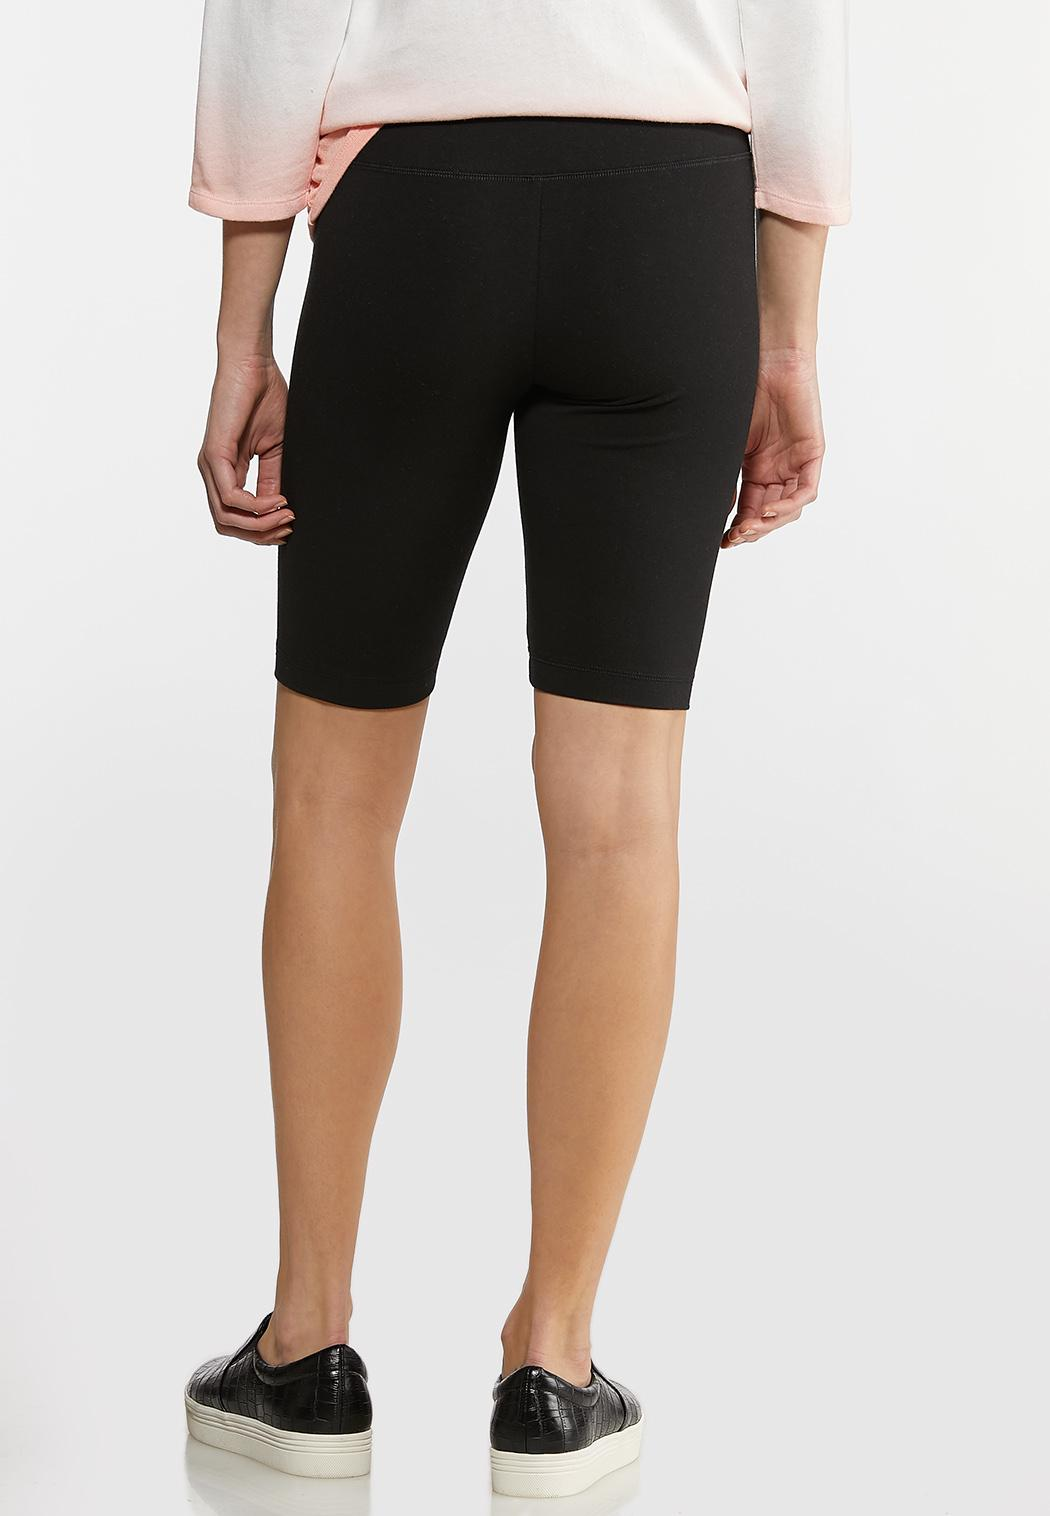 Pull-On Stretch Shorts (Item #44142772)